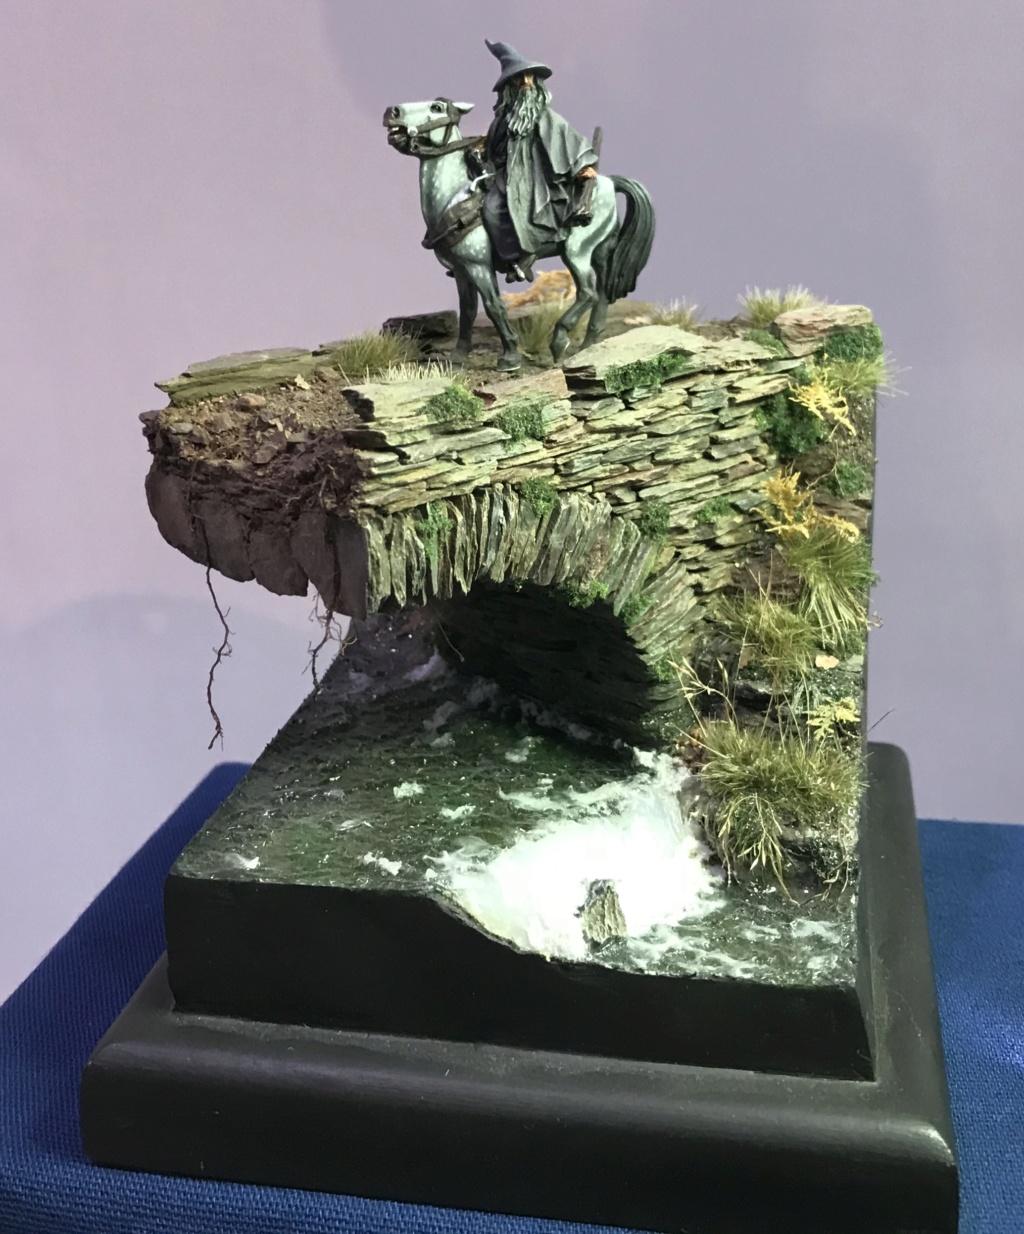 Salon de la maquette 2019 Albi (tarn) 4c220410